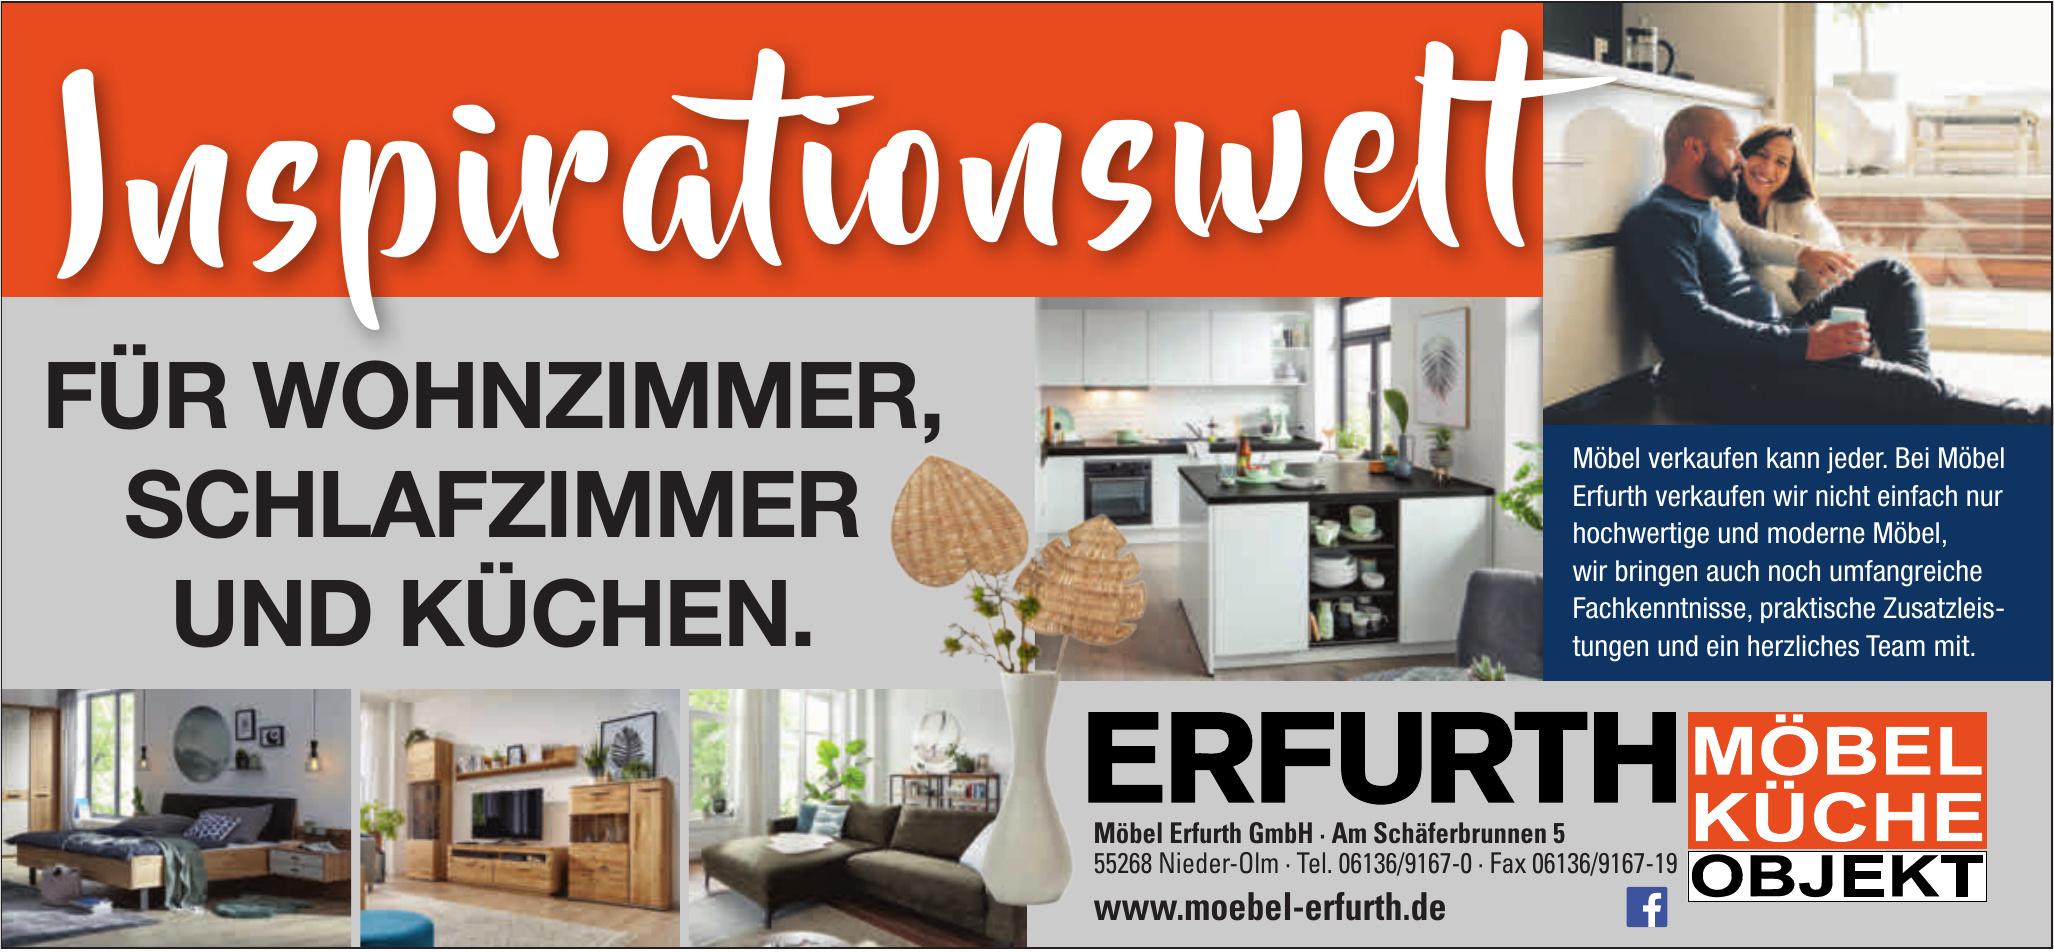 Möbel Erfurth GmbH